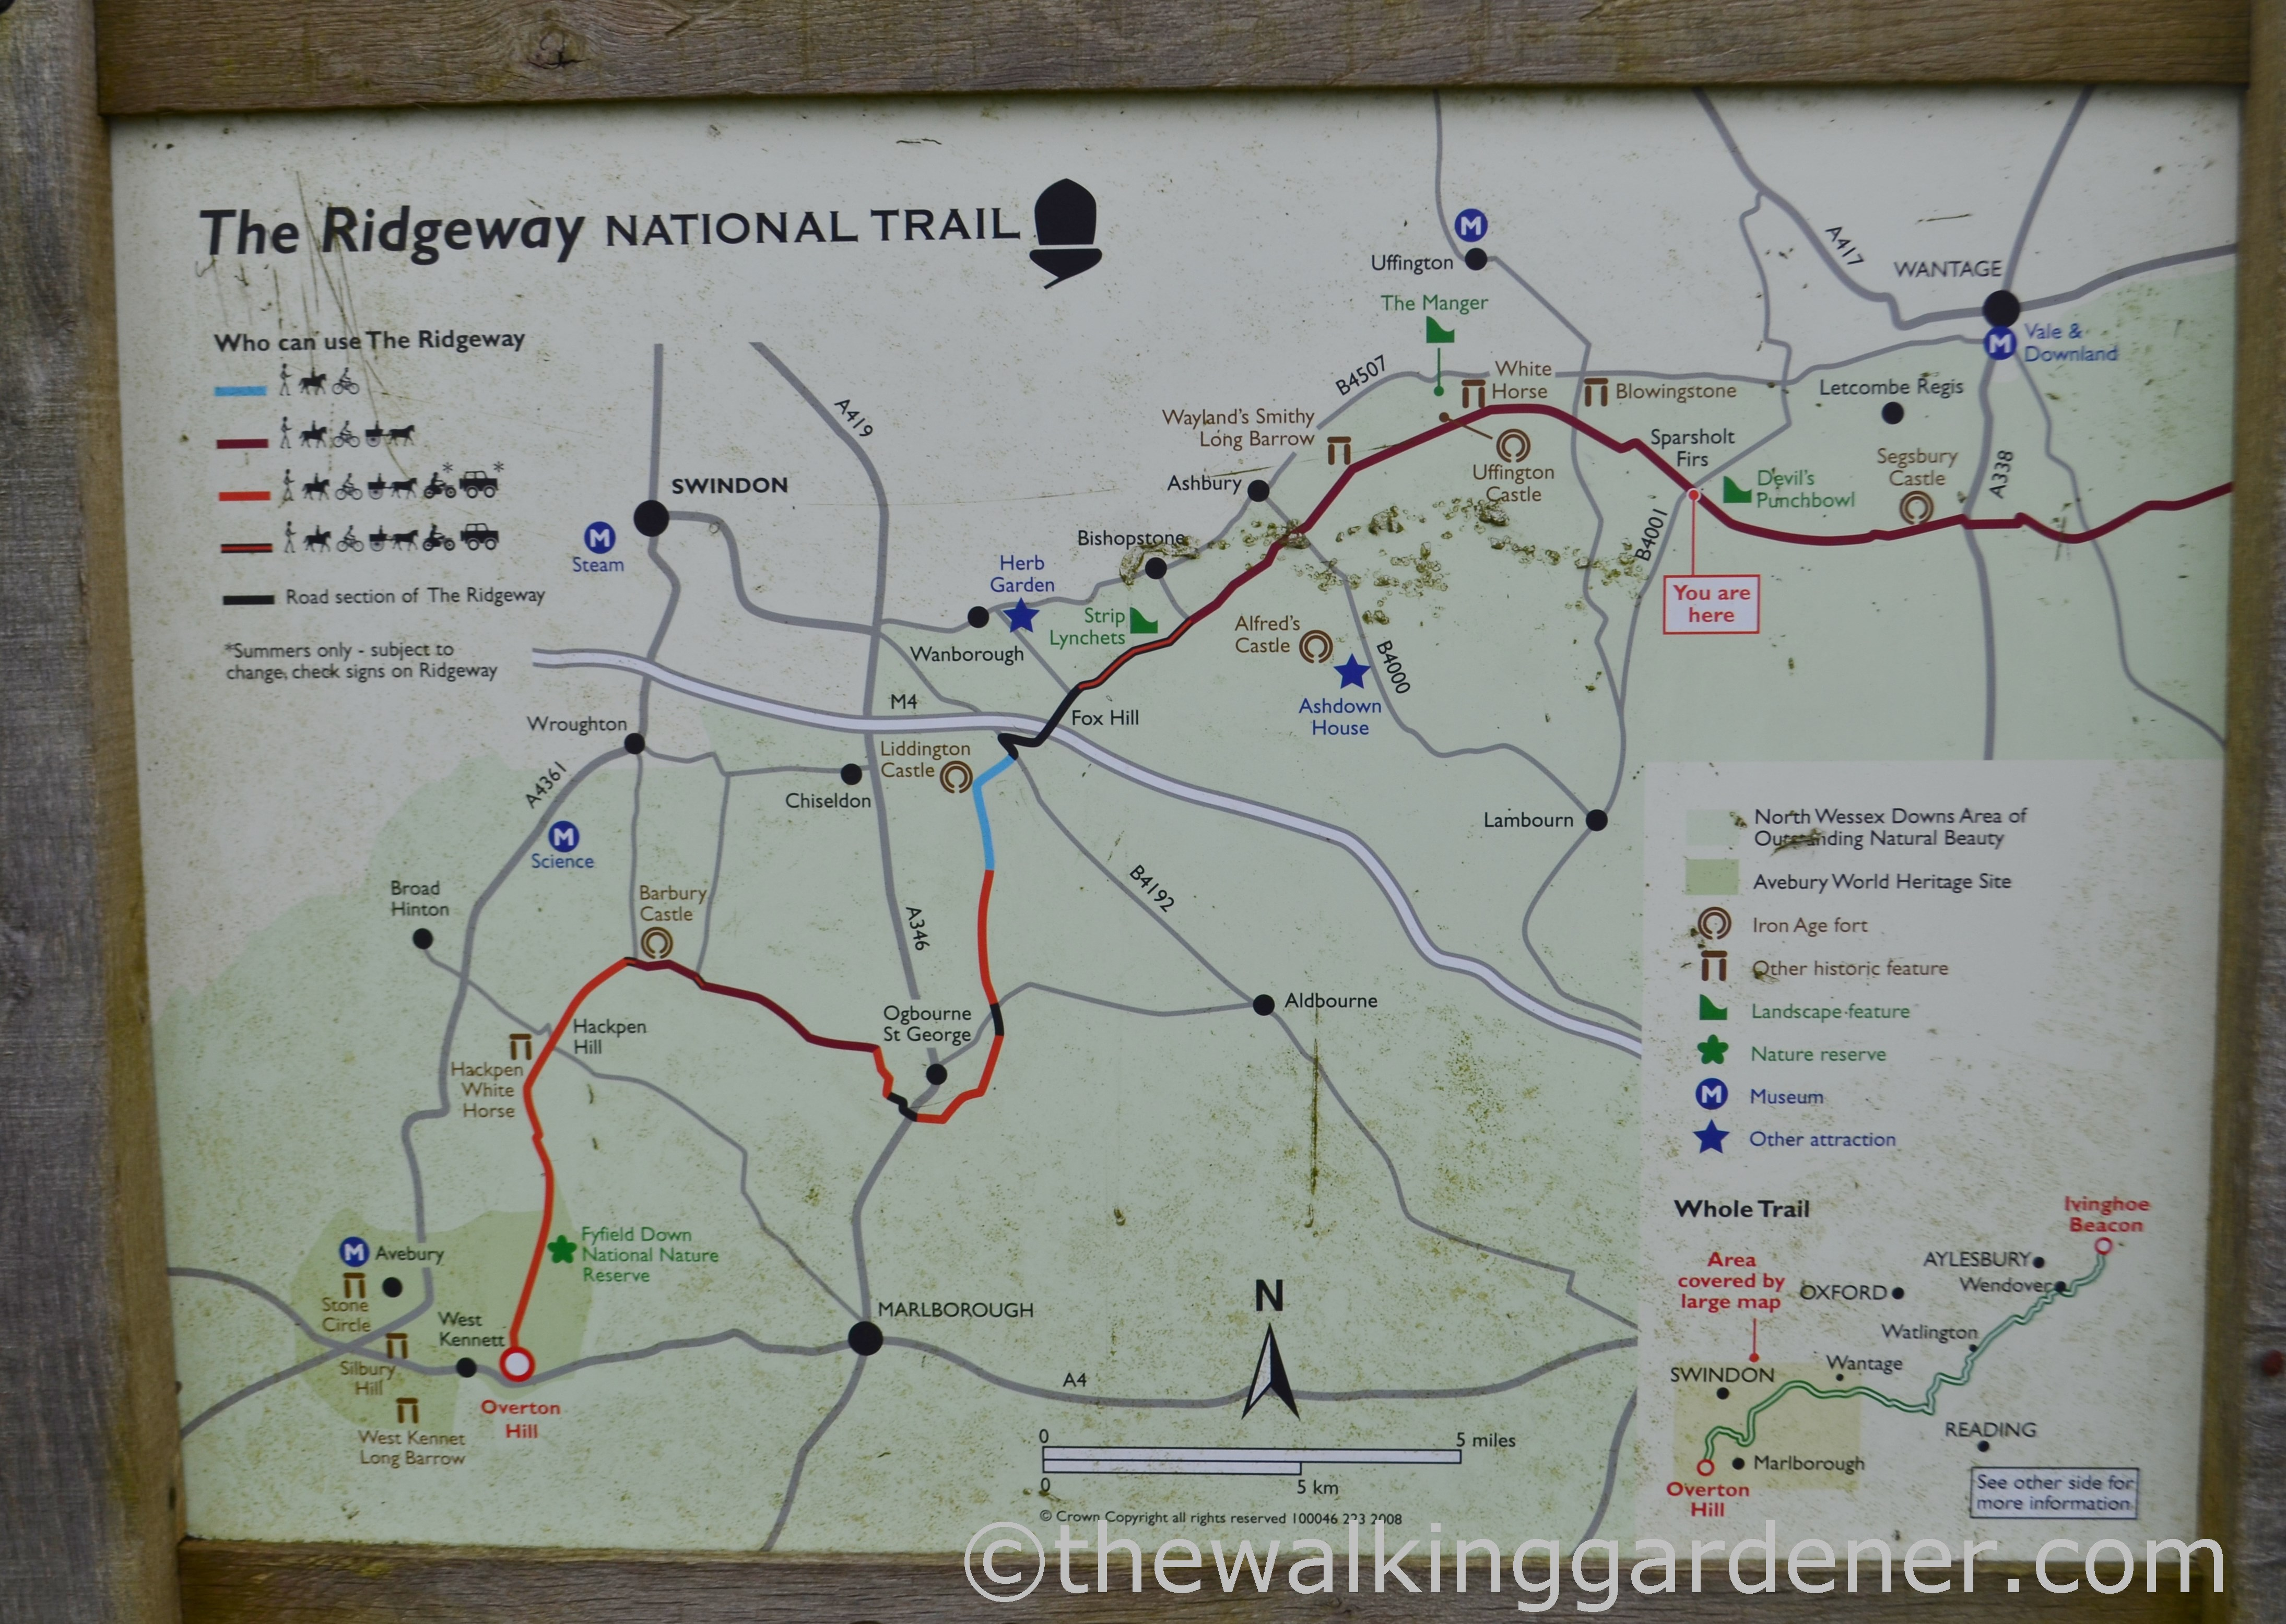 The Ridgeway Map (2)